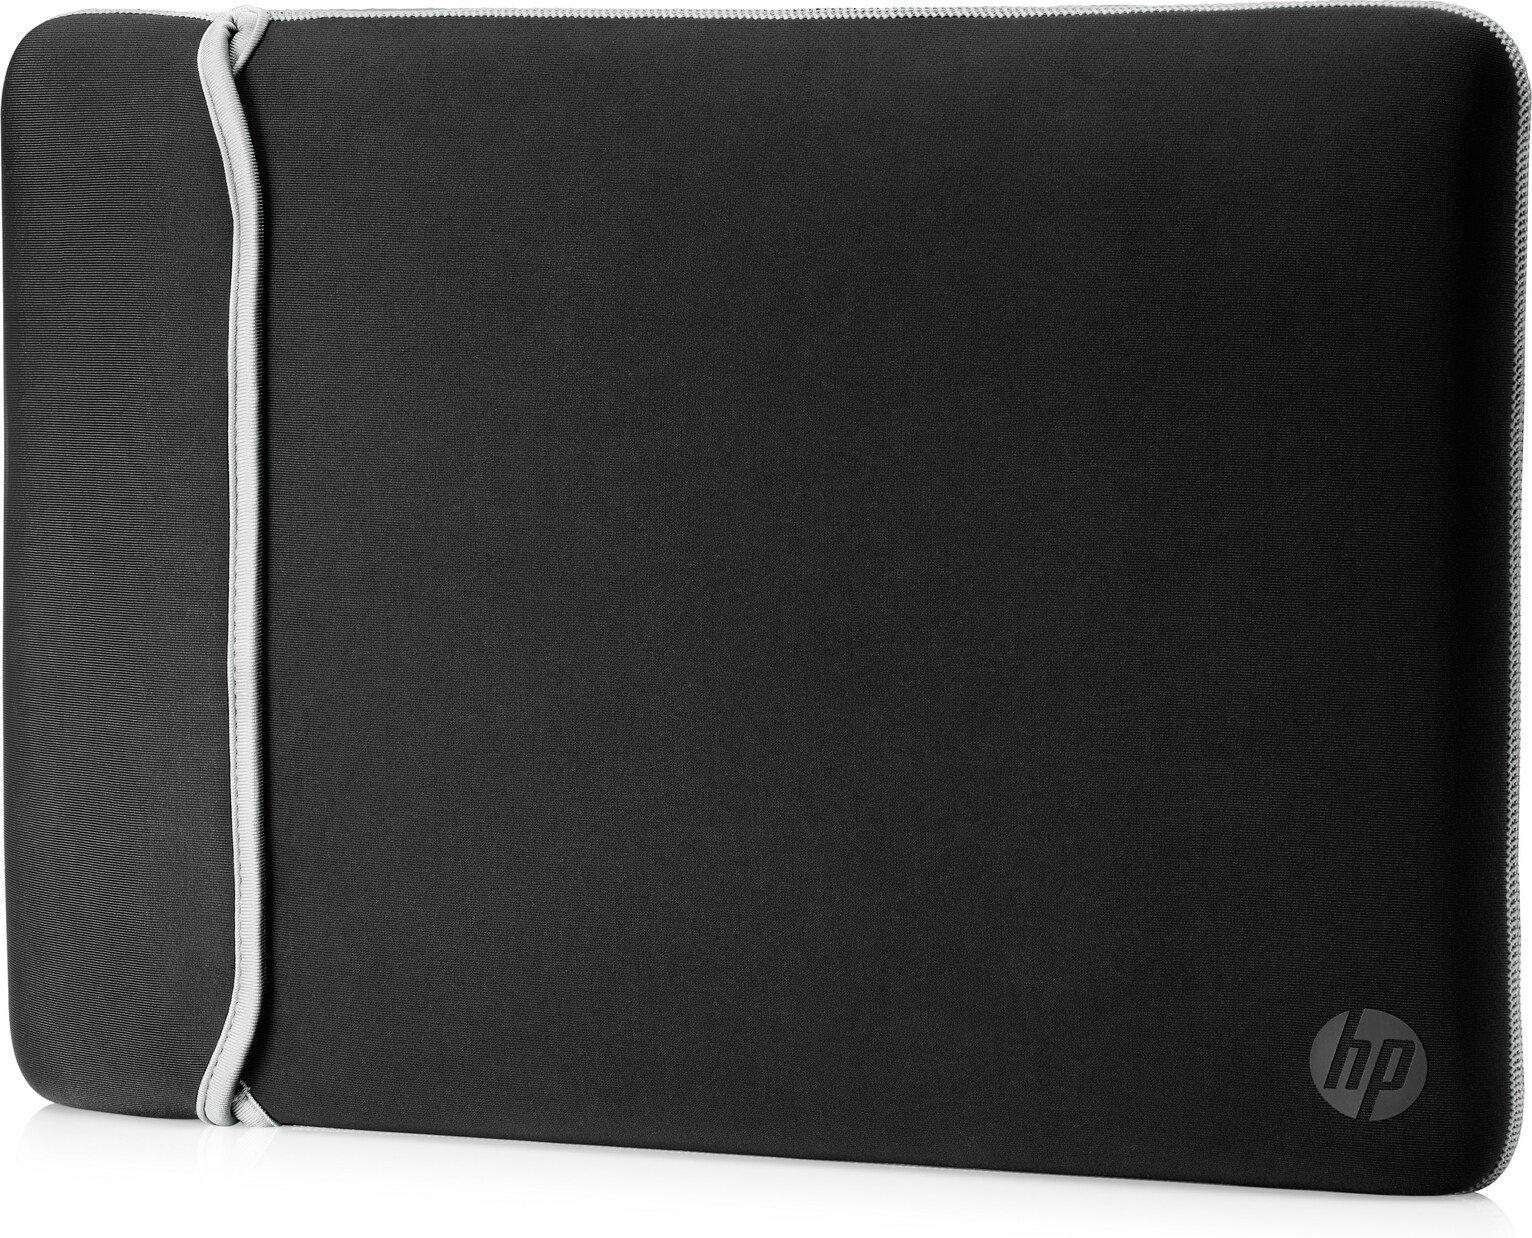 HP 14 Inch Reversible Laptop Sleeve - Silver & Black